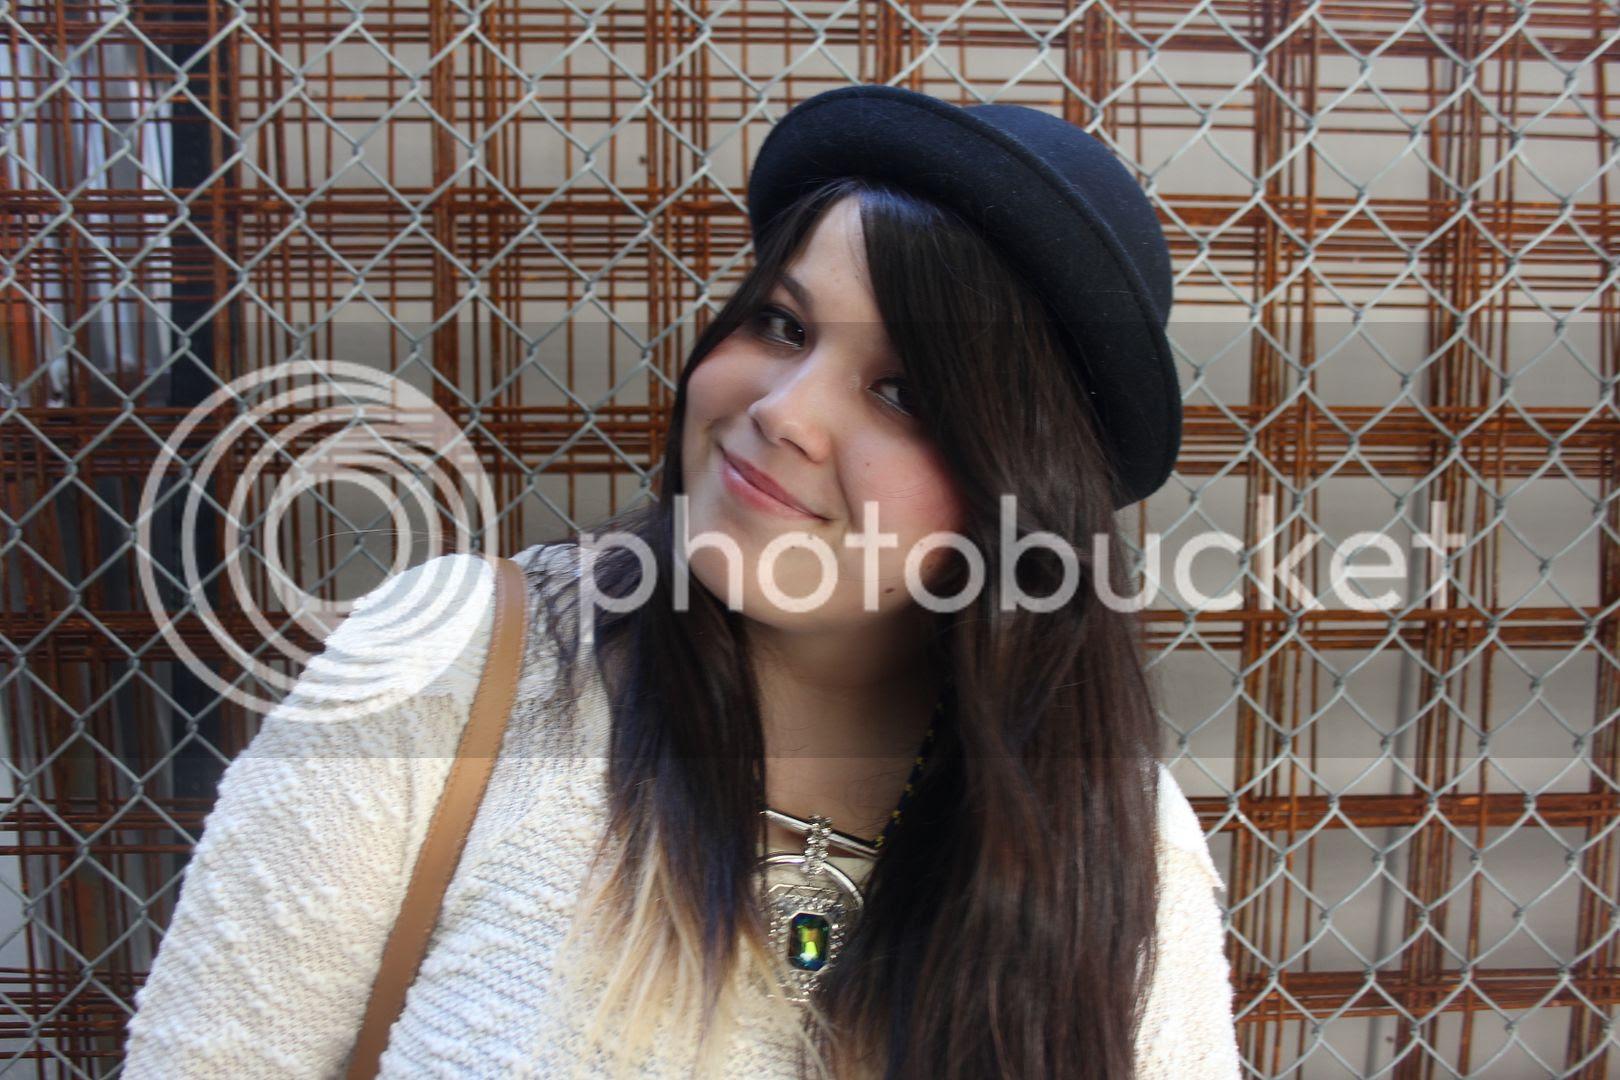 addition elle jessica ip plus size fashion plus size style full figure fashion canadian plus blogger white addition elle top bowler hat toronto